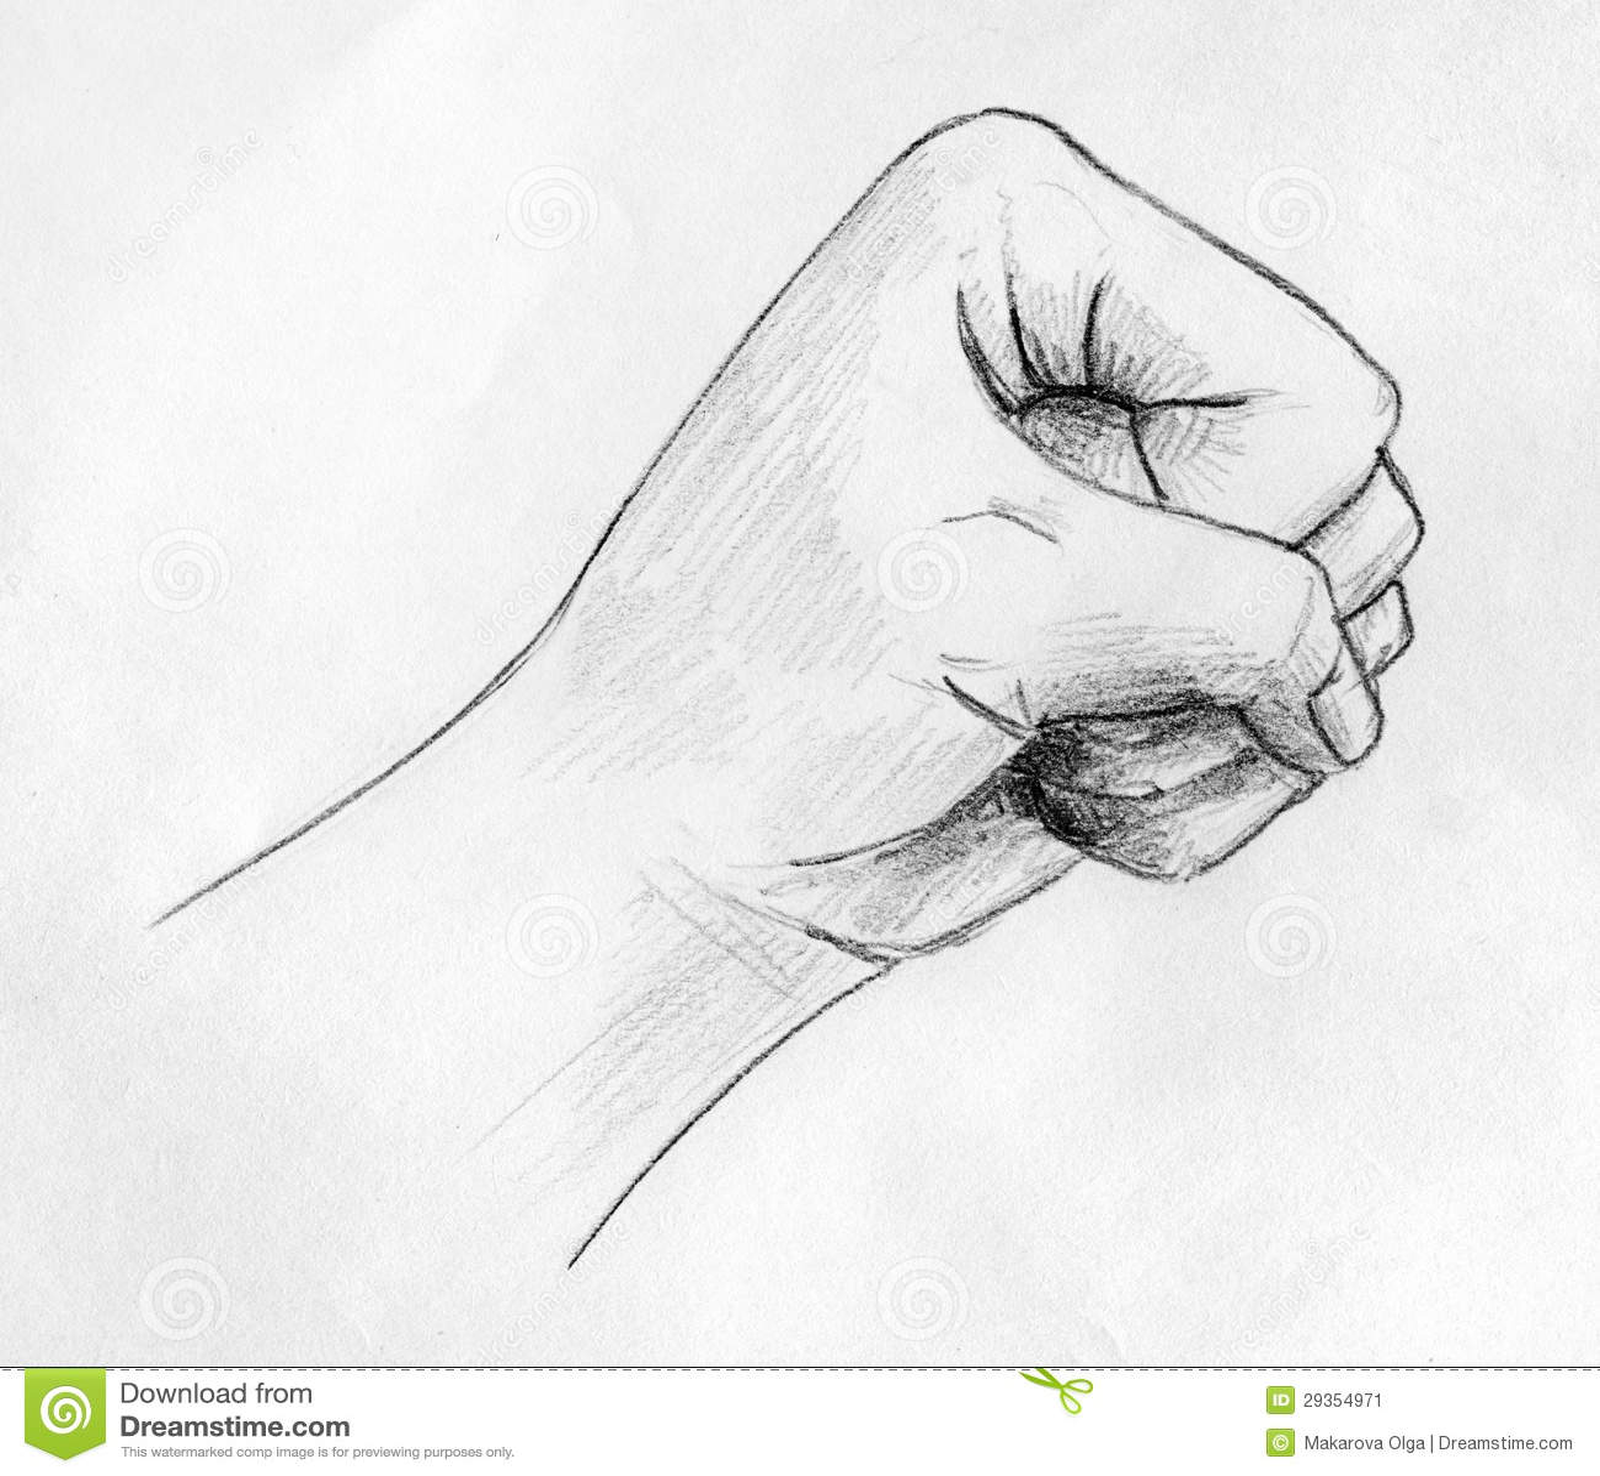 Pencil drawn sketch of a left hands fist